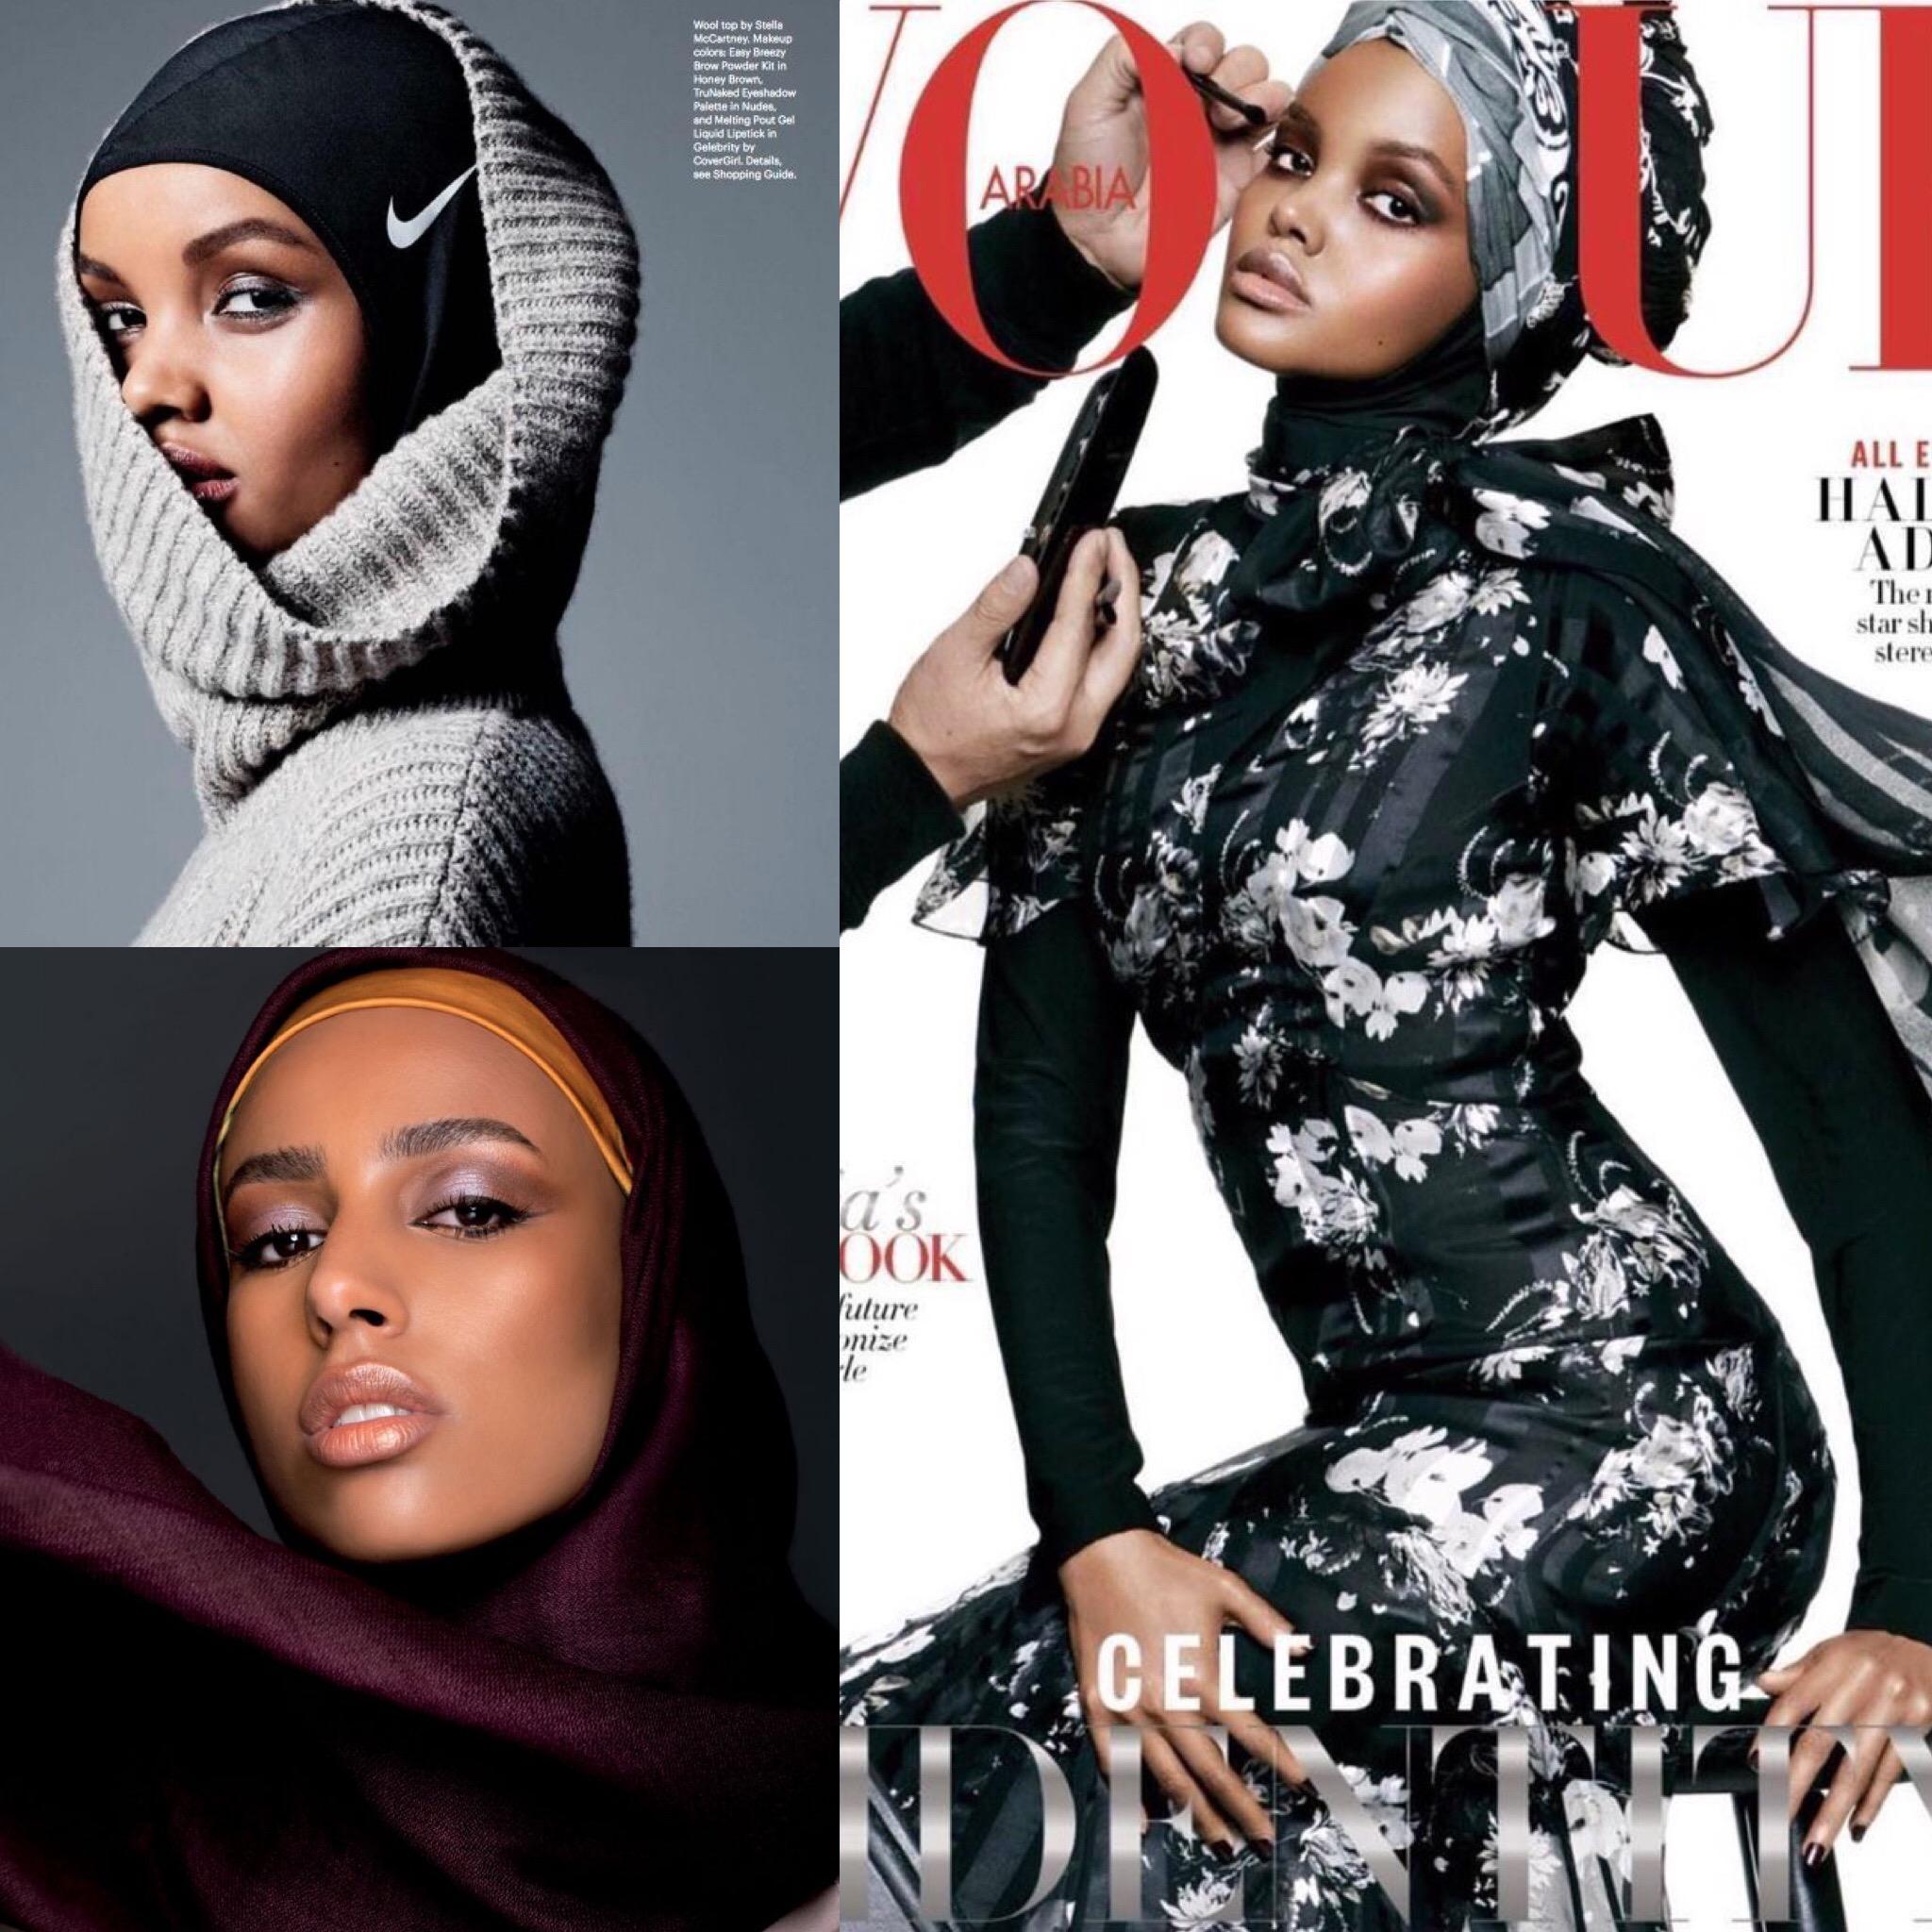 Top Left:  Halima Aden modeling a  Nike Hijab   Bottom Left:  Photograph by Mireya De Sagarra for  Vogue Arabia   Right:  Halima Aden wearing hijab on cover of  Vogue Arabia